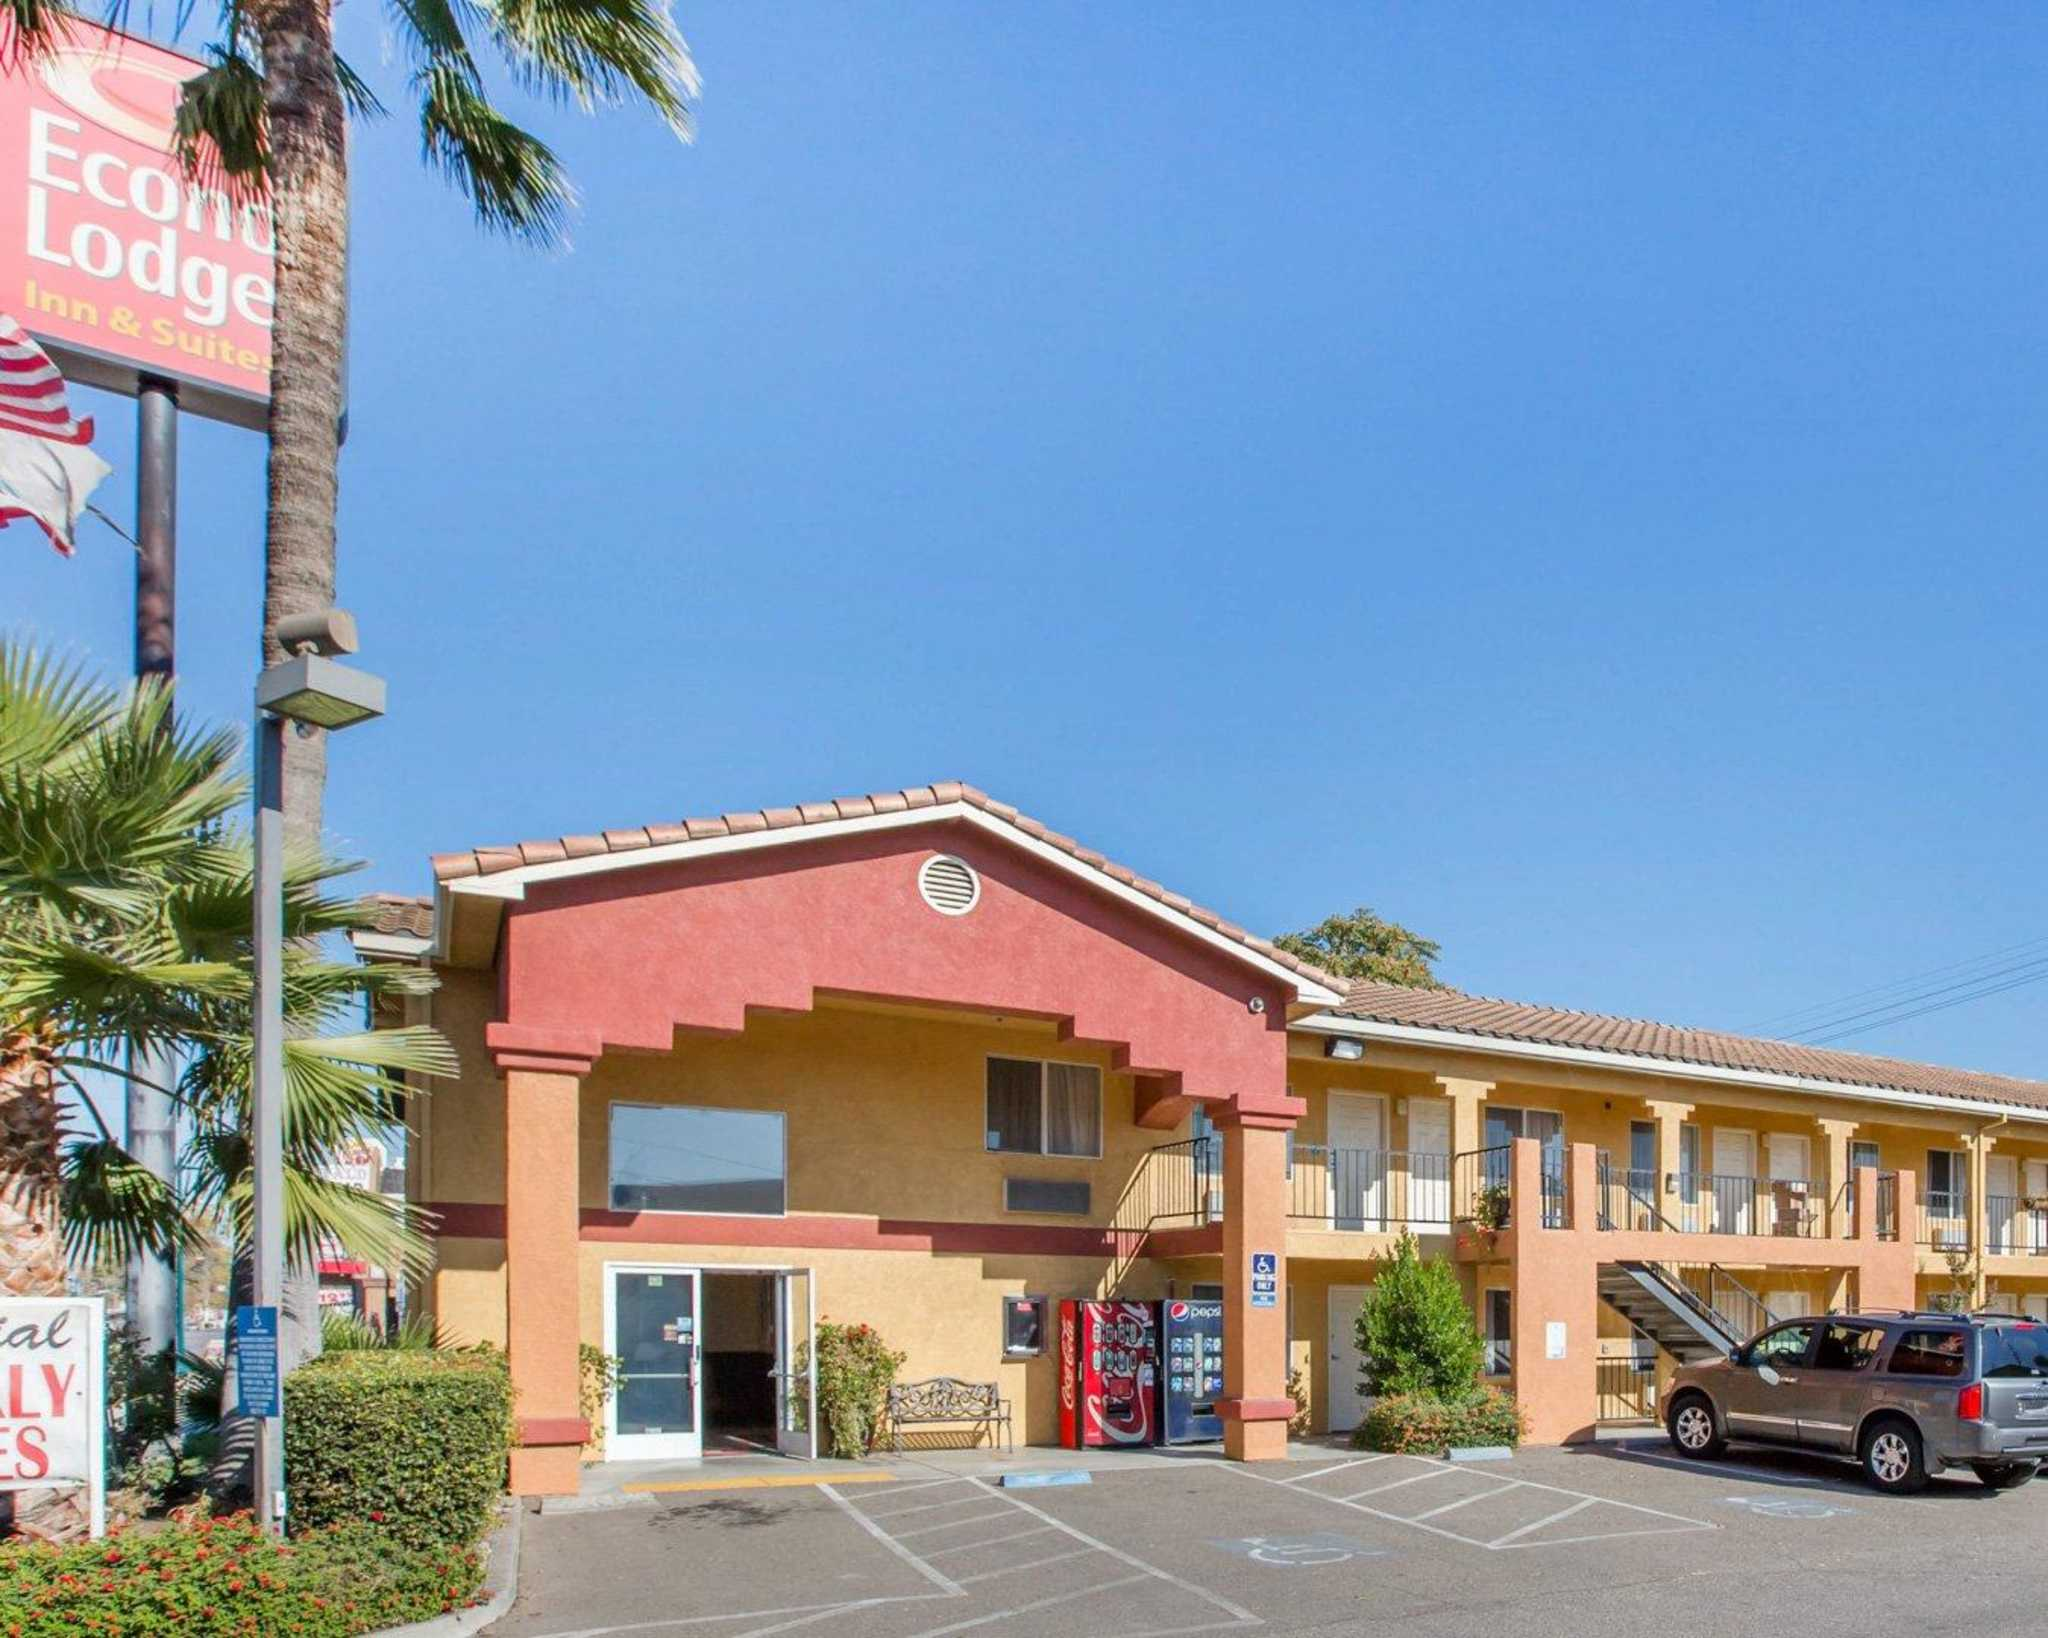 Econo Lodge Inn & Suites Lodi image 2